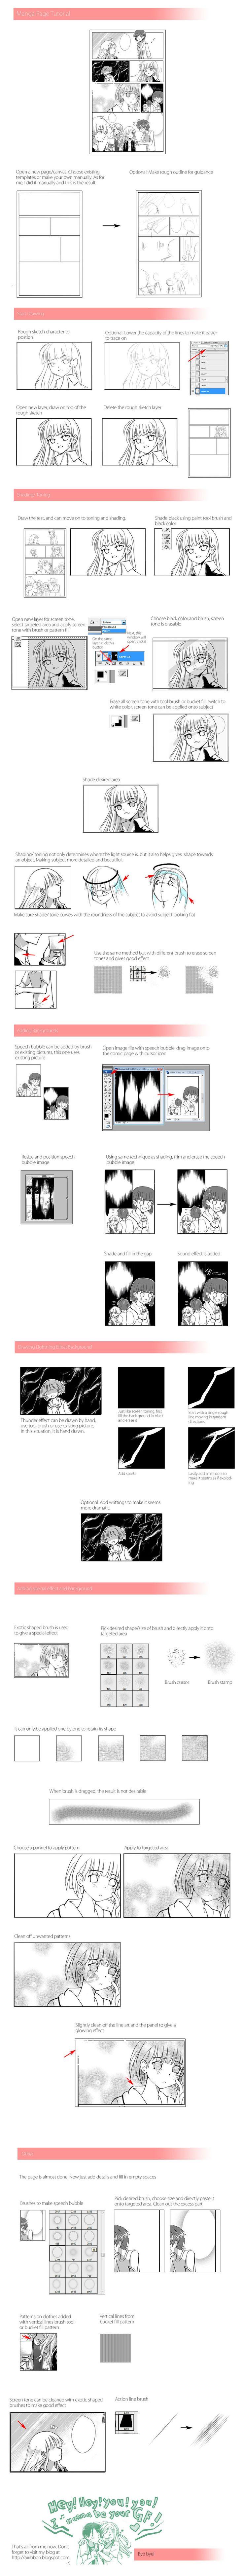 Manga page Tutorial by ~airibbon